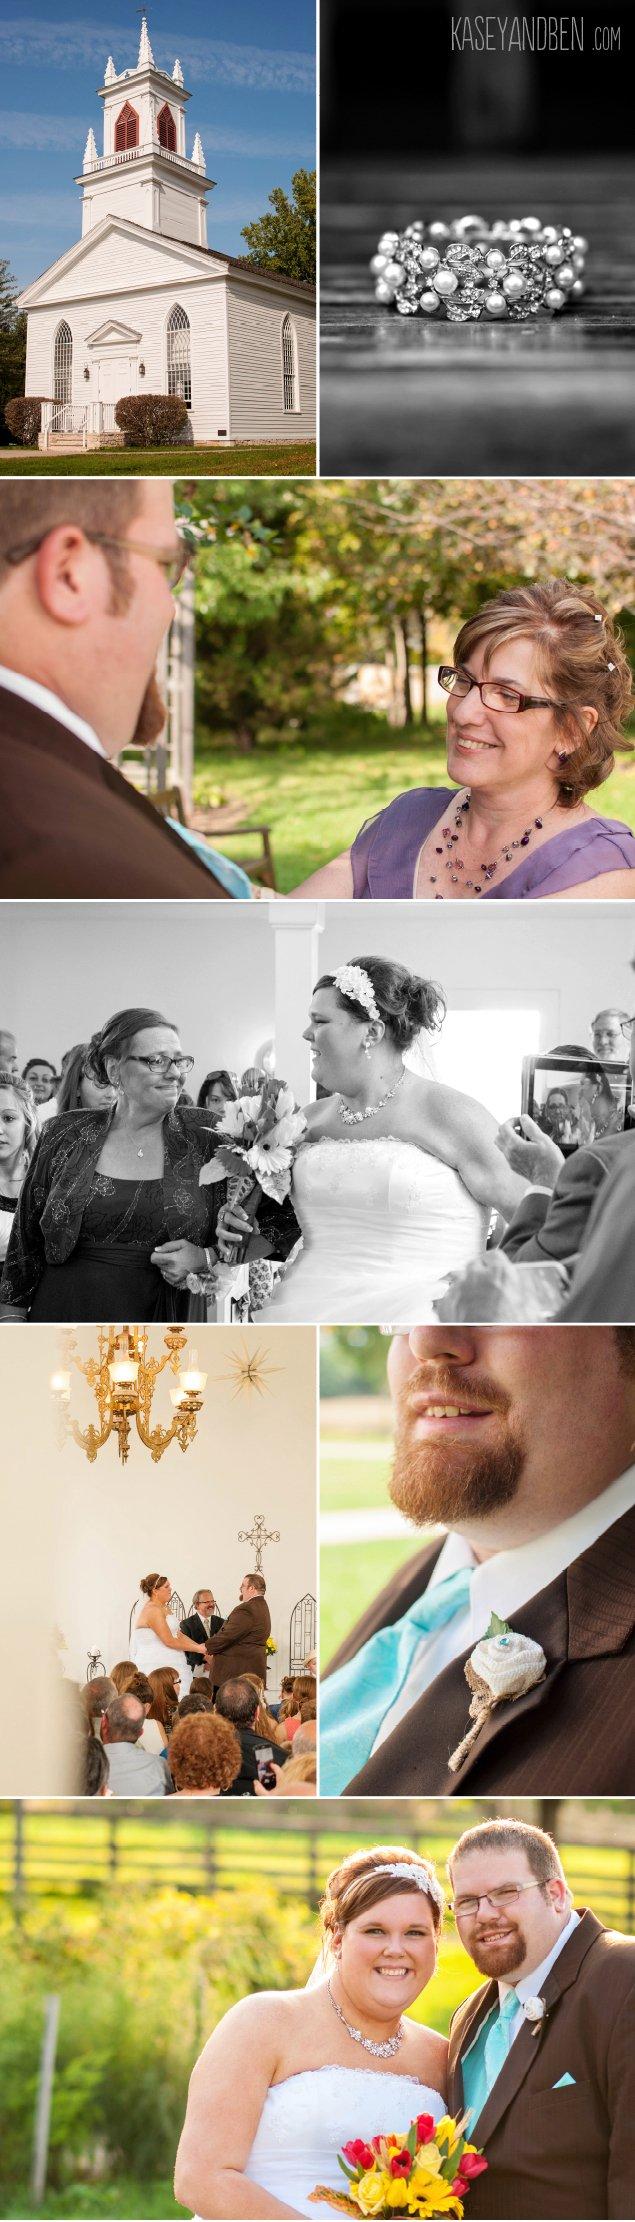 Heritage_Hill_Chapel_Wedding_Photography_Green_Bay_Beautiful1